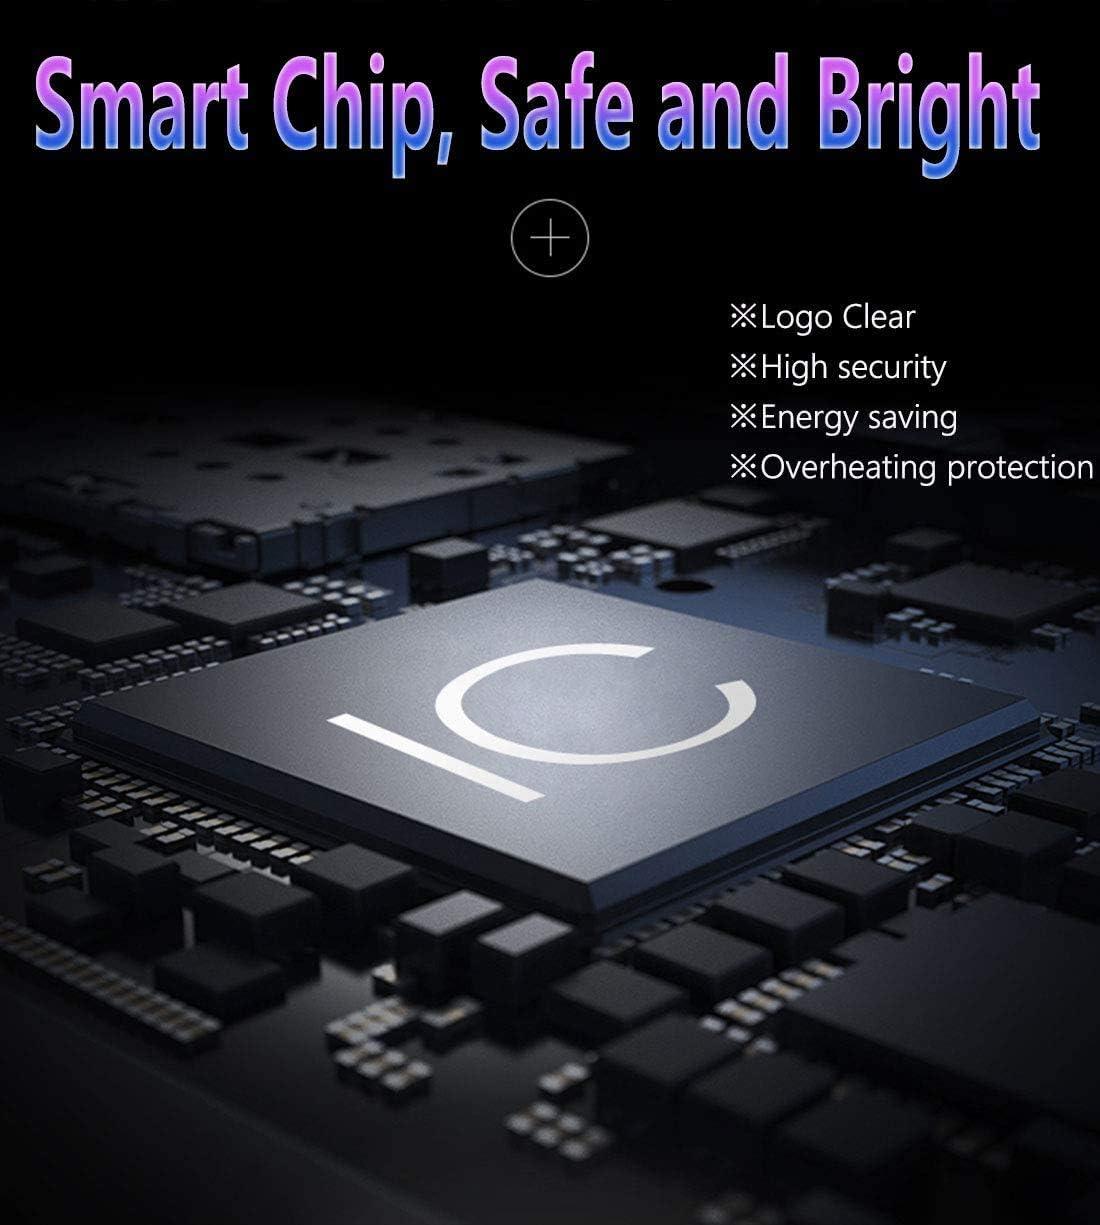 2 Pcs Car Projection LED Projector Door Shadow Light Welcome Light Laser Emblem Logo Lamps Kit for Benz Aclass W176//W177 A180 AMG//AMG A45 s//a35//a200d//a220L//a200L//A250 SPORT 4MATIC// front door